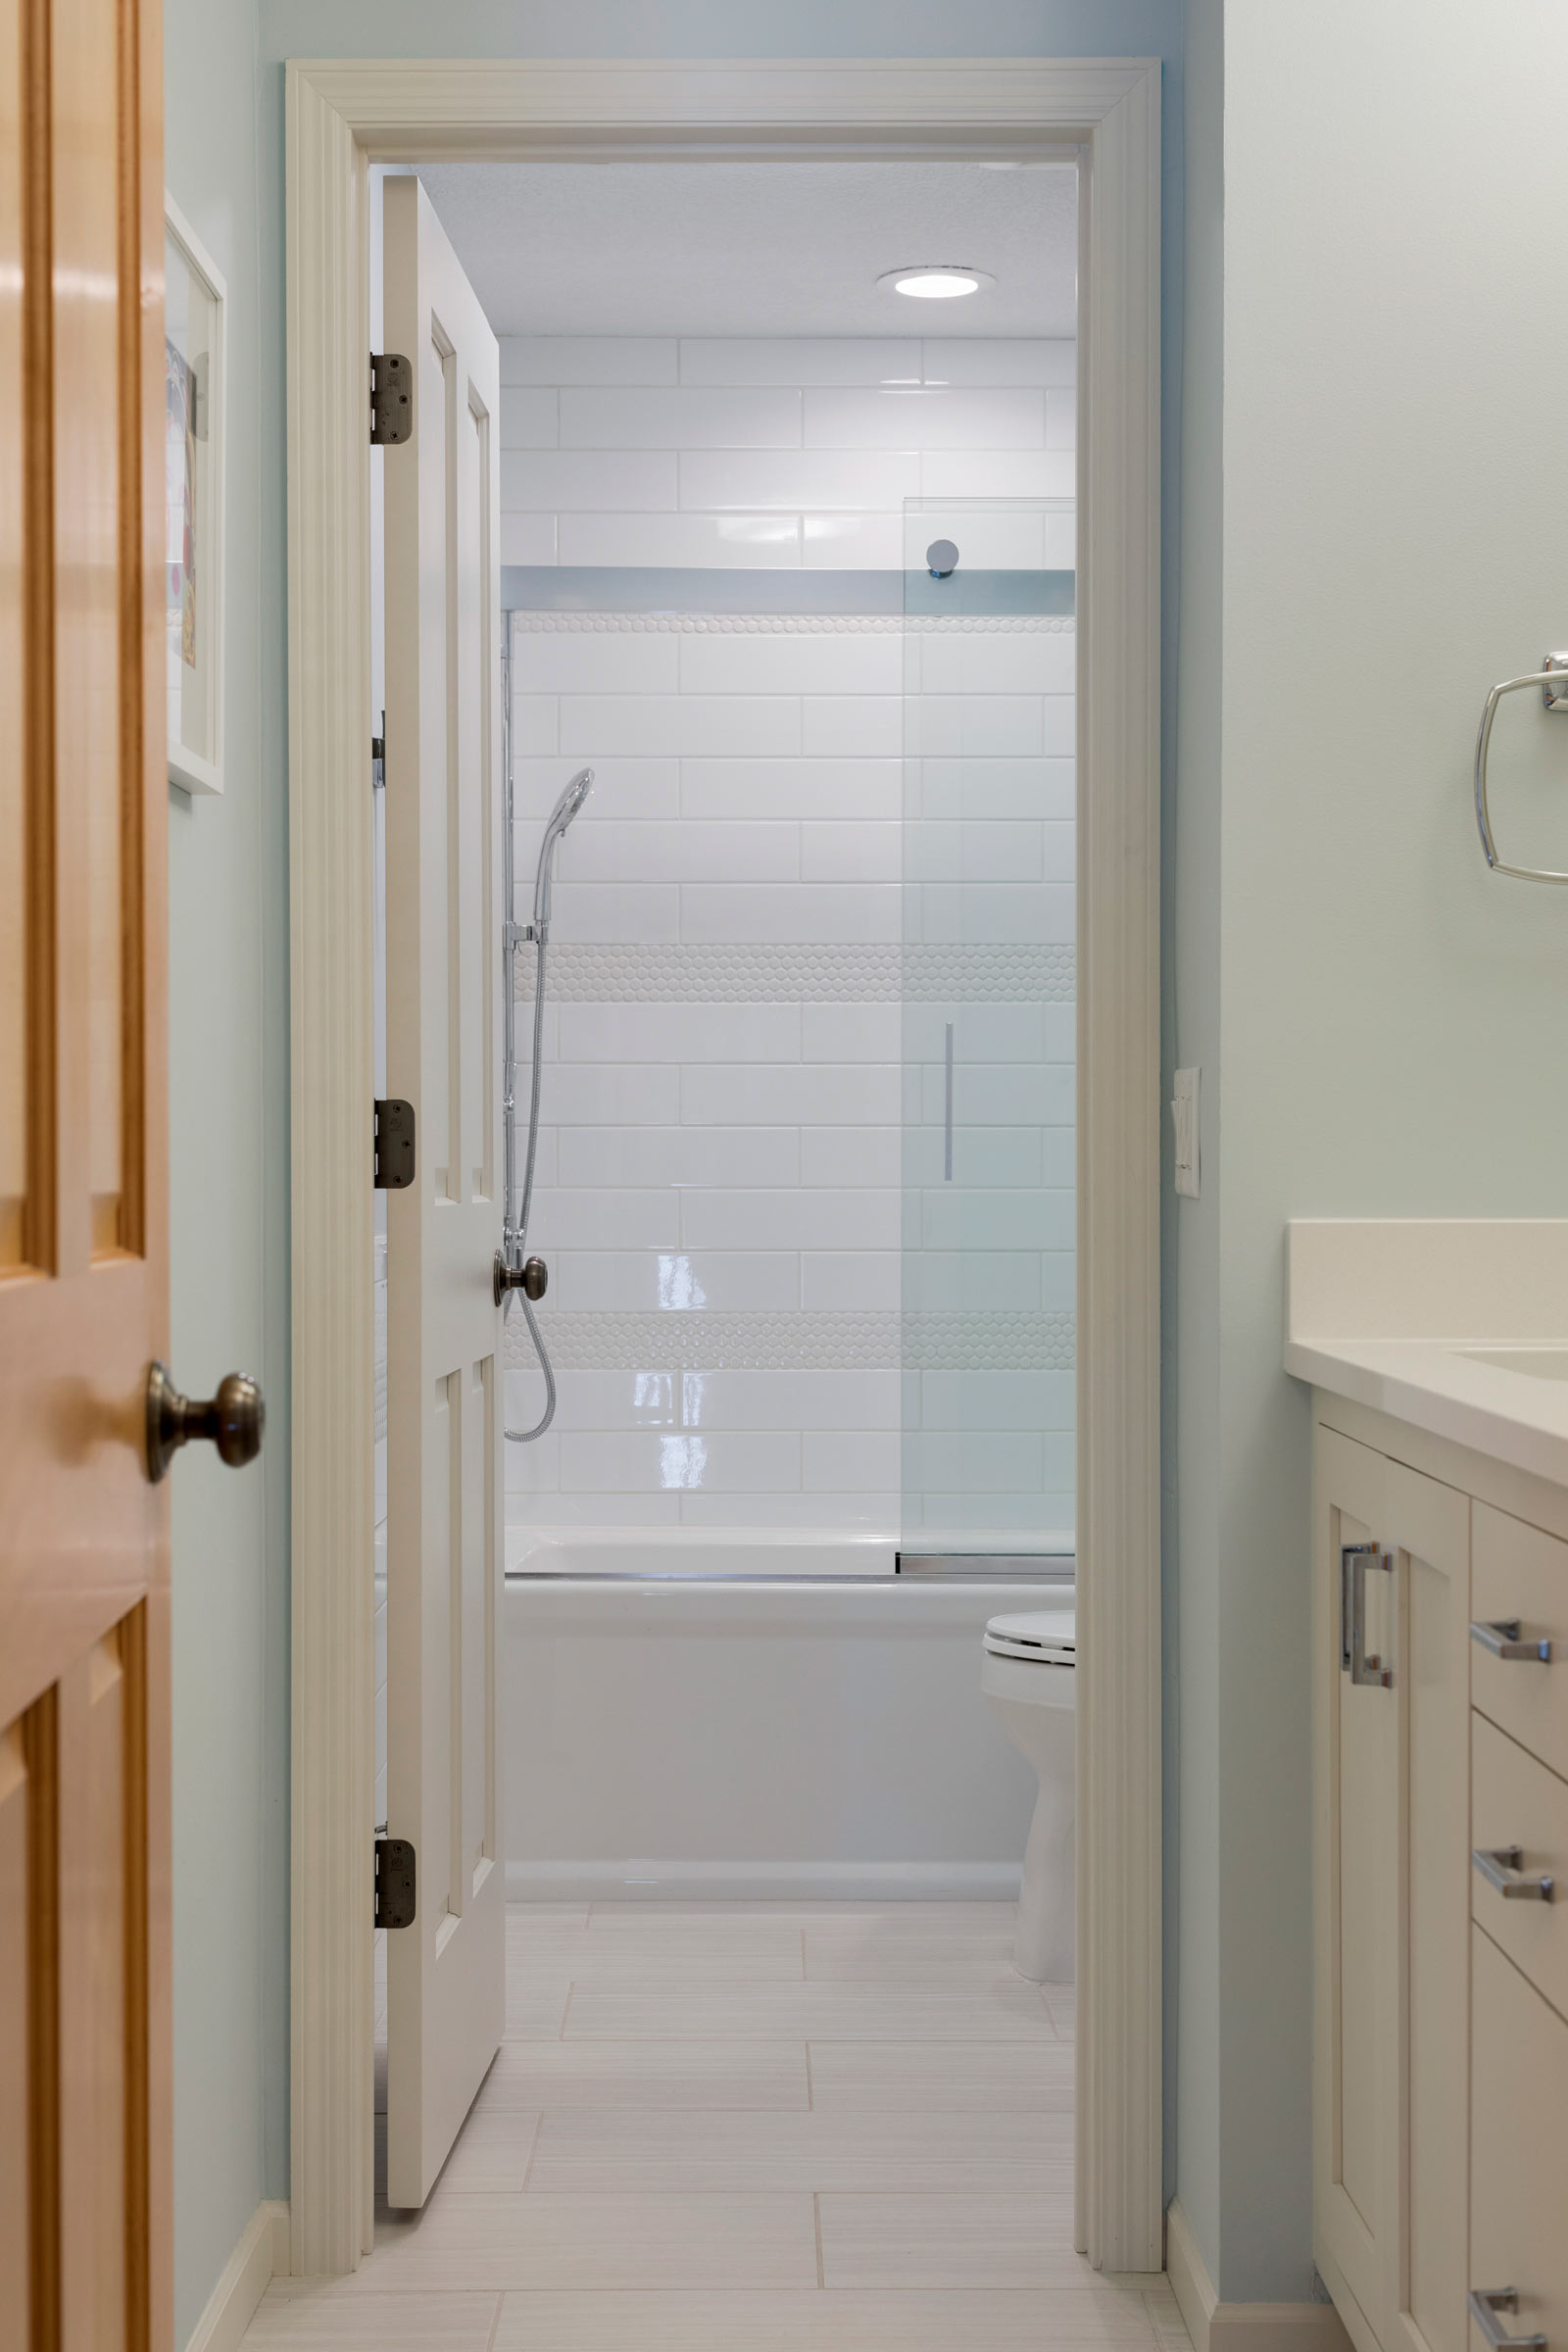 Bath design for teenage girl, walk through view from vanity to shower - Maven Design Studio